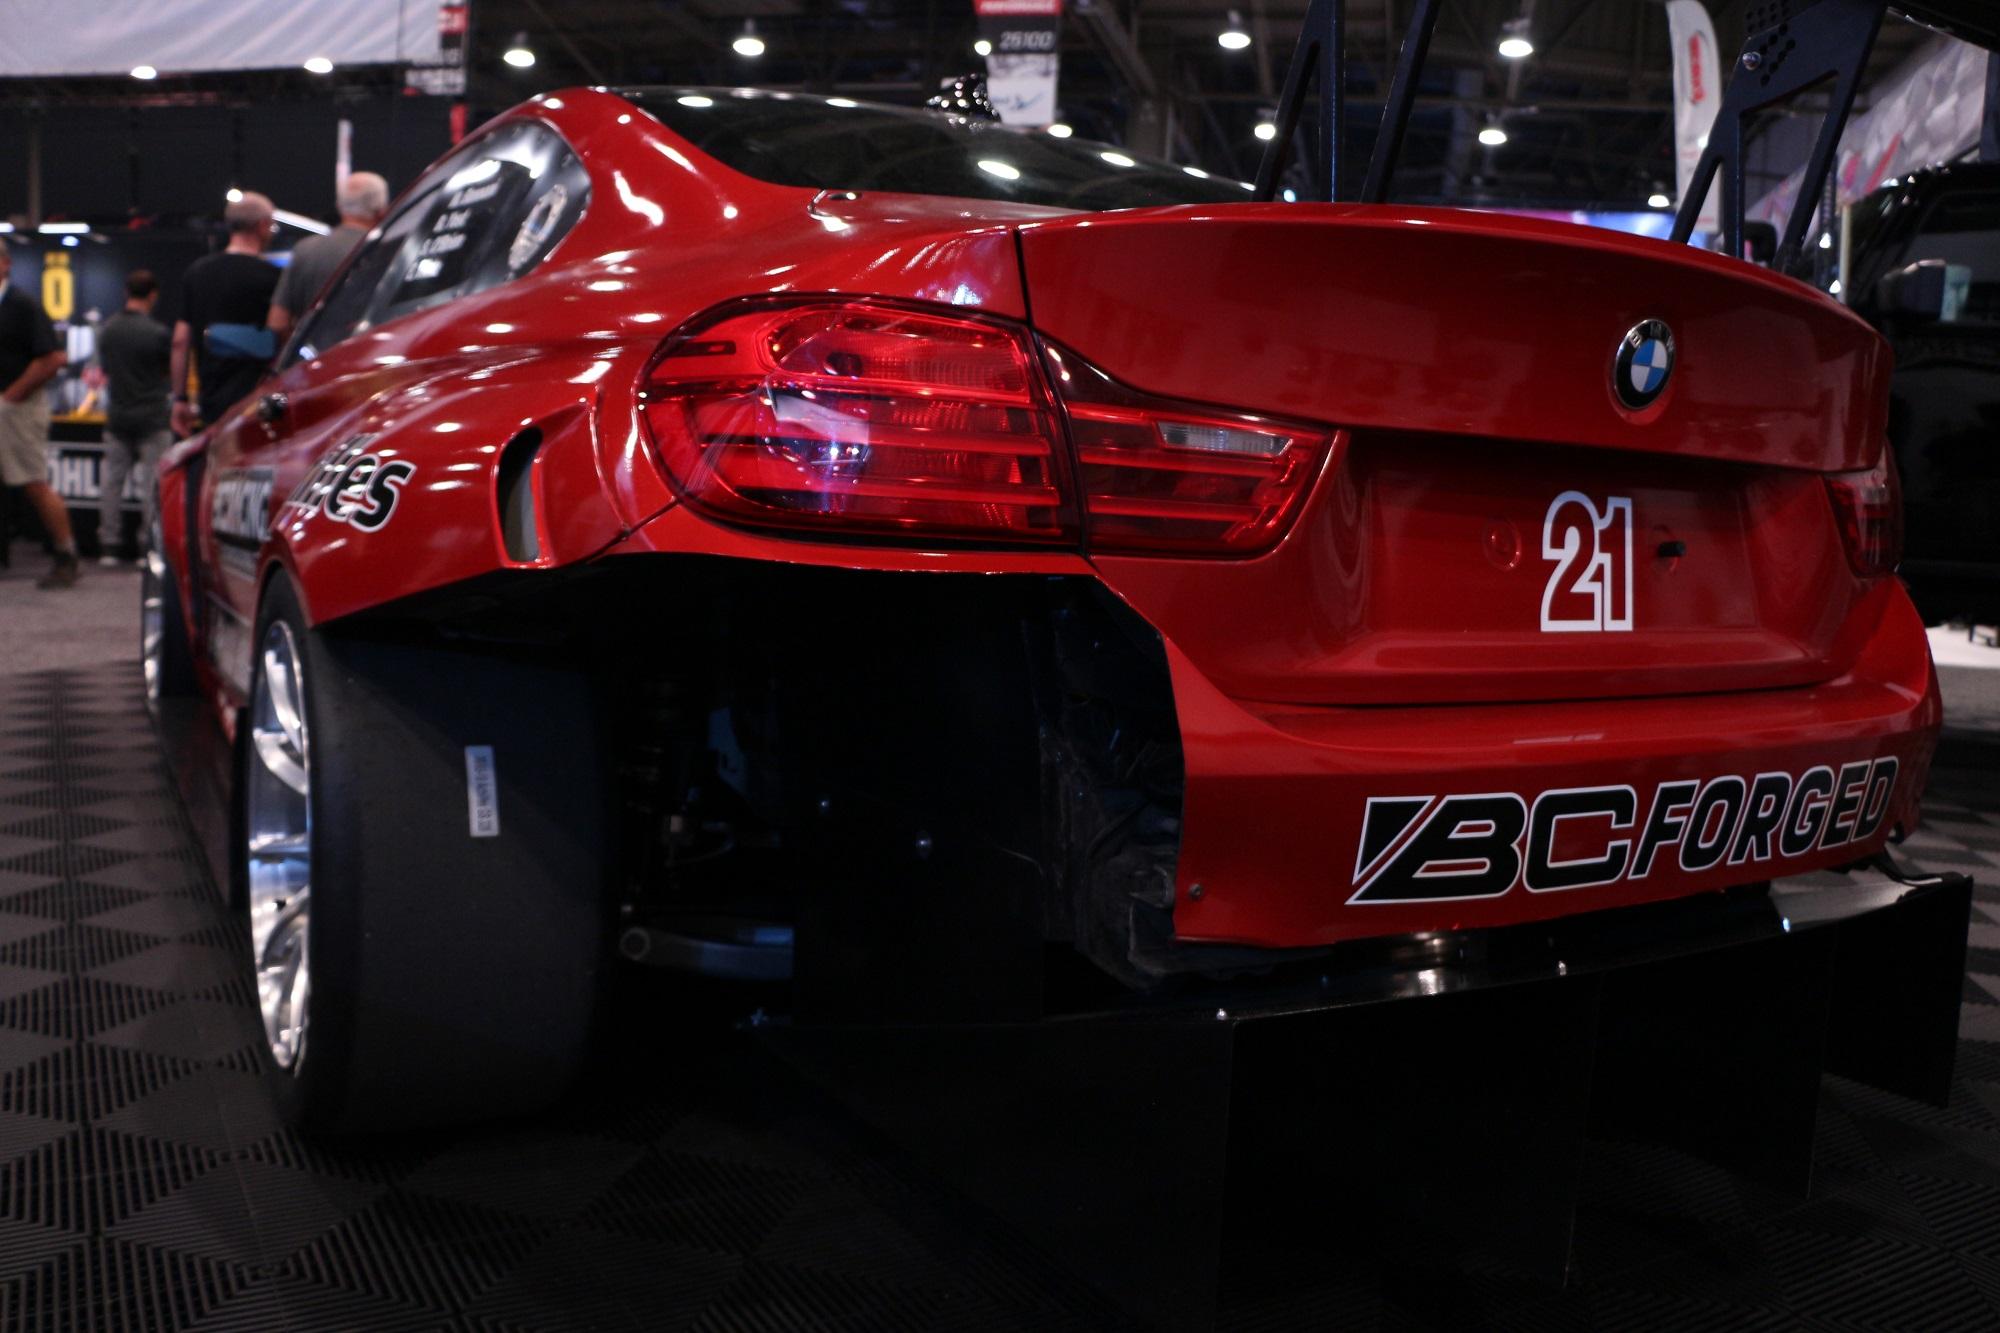 6SpeedOnline.com SEMA 2017 BMW M3 M4 E46 E92 F82 Yost Autosport Michael Essa Kristaps Bluss Formula Drift Racing Motorsports